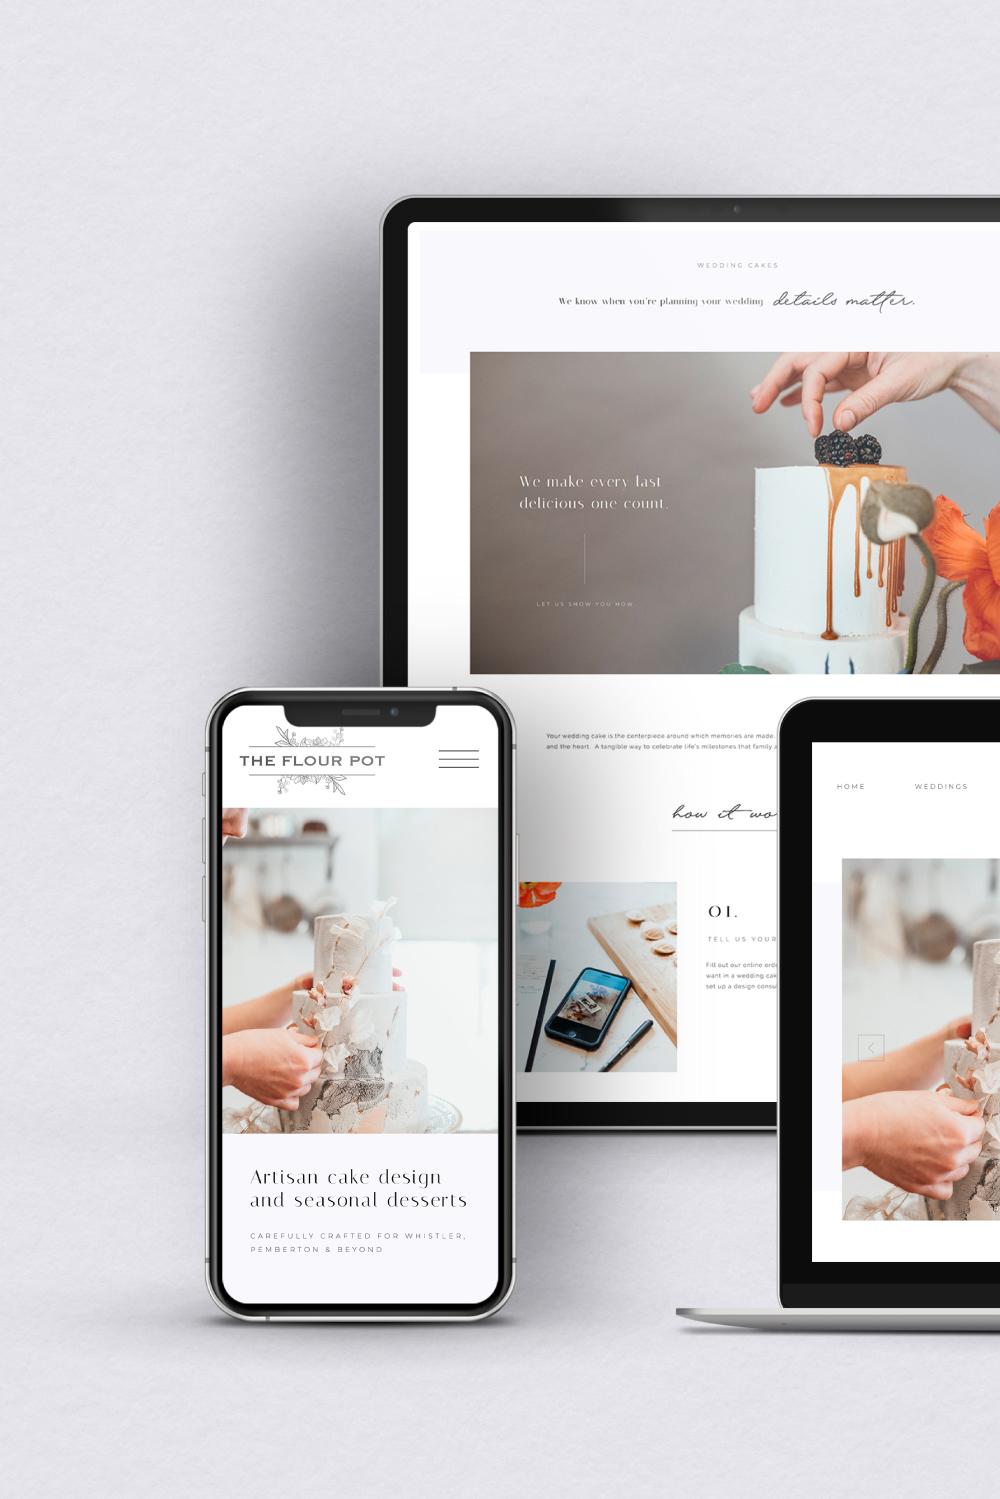 Featherlite Designs | Vancouver Island Web Design + Branding